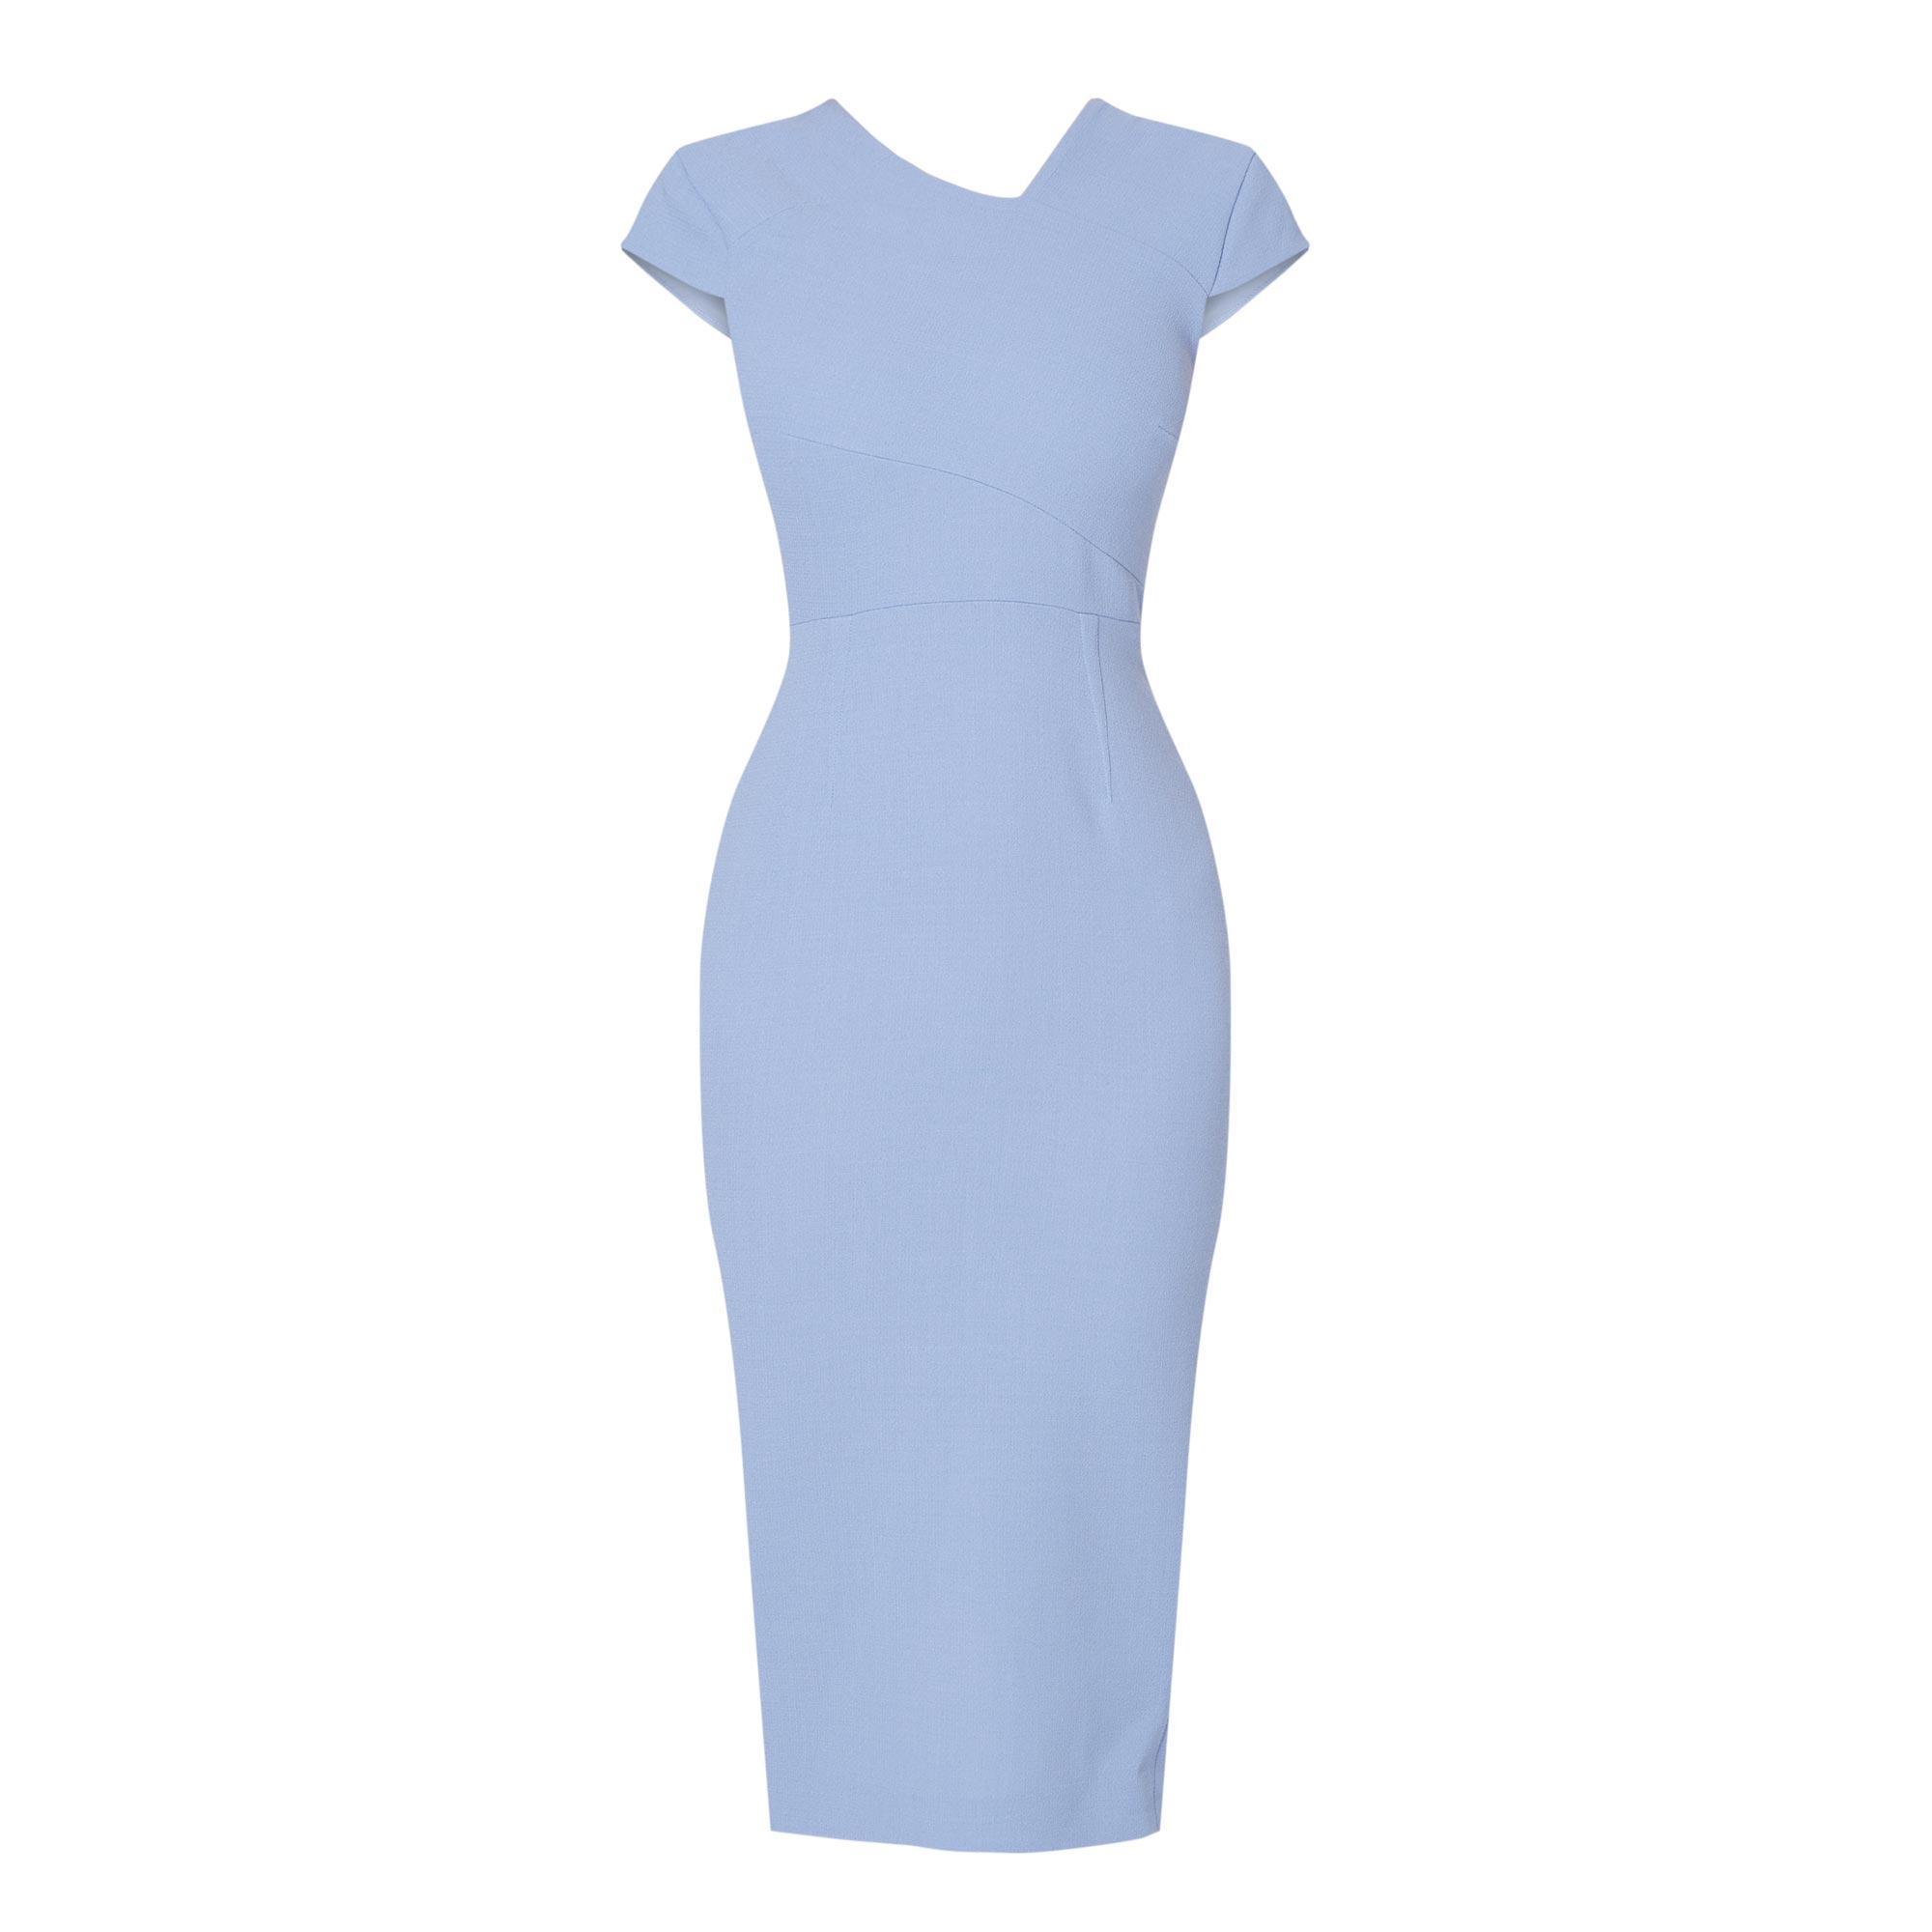 Ayers Dress